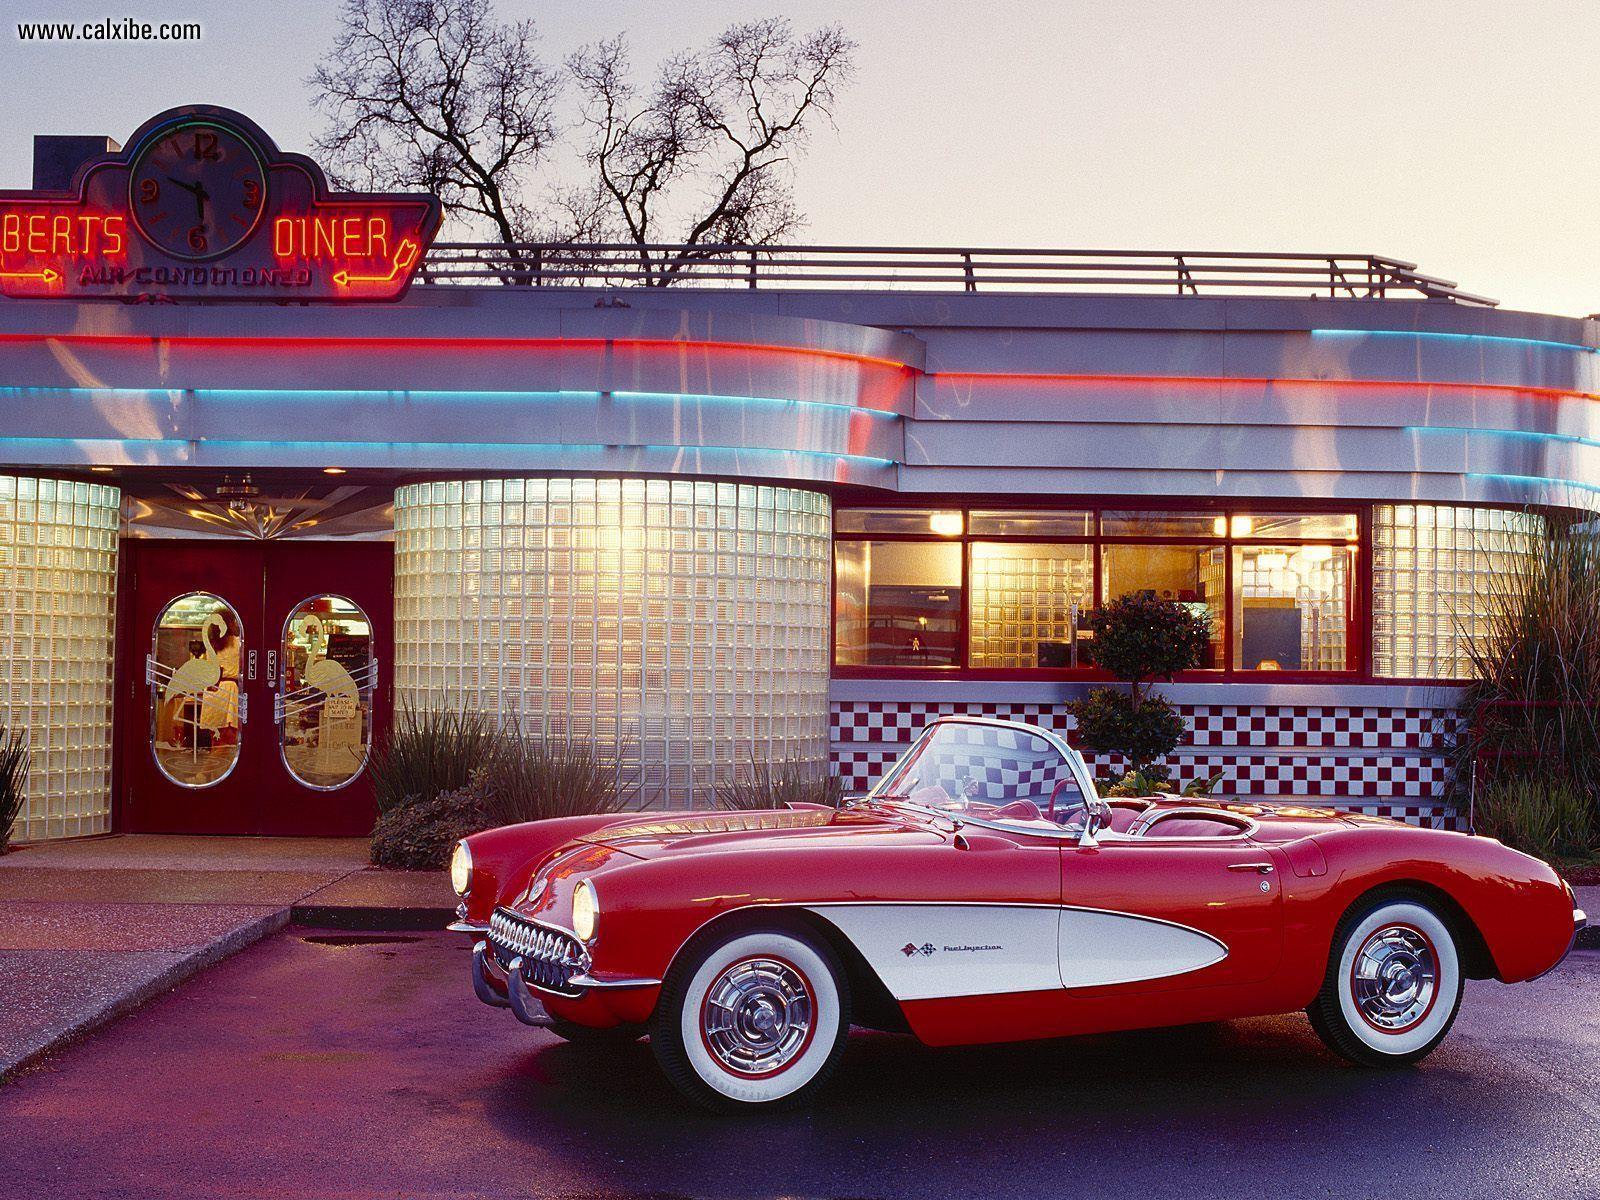 1957 chevrolet corvette for sale on classiccars com 31 - El Sue O Eterno Chevrolet Corvette 1957